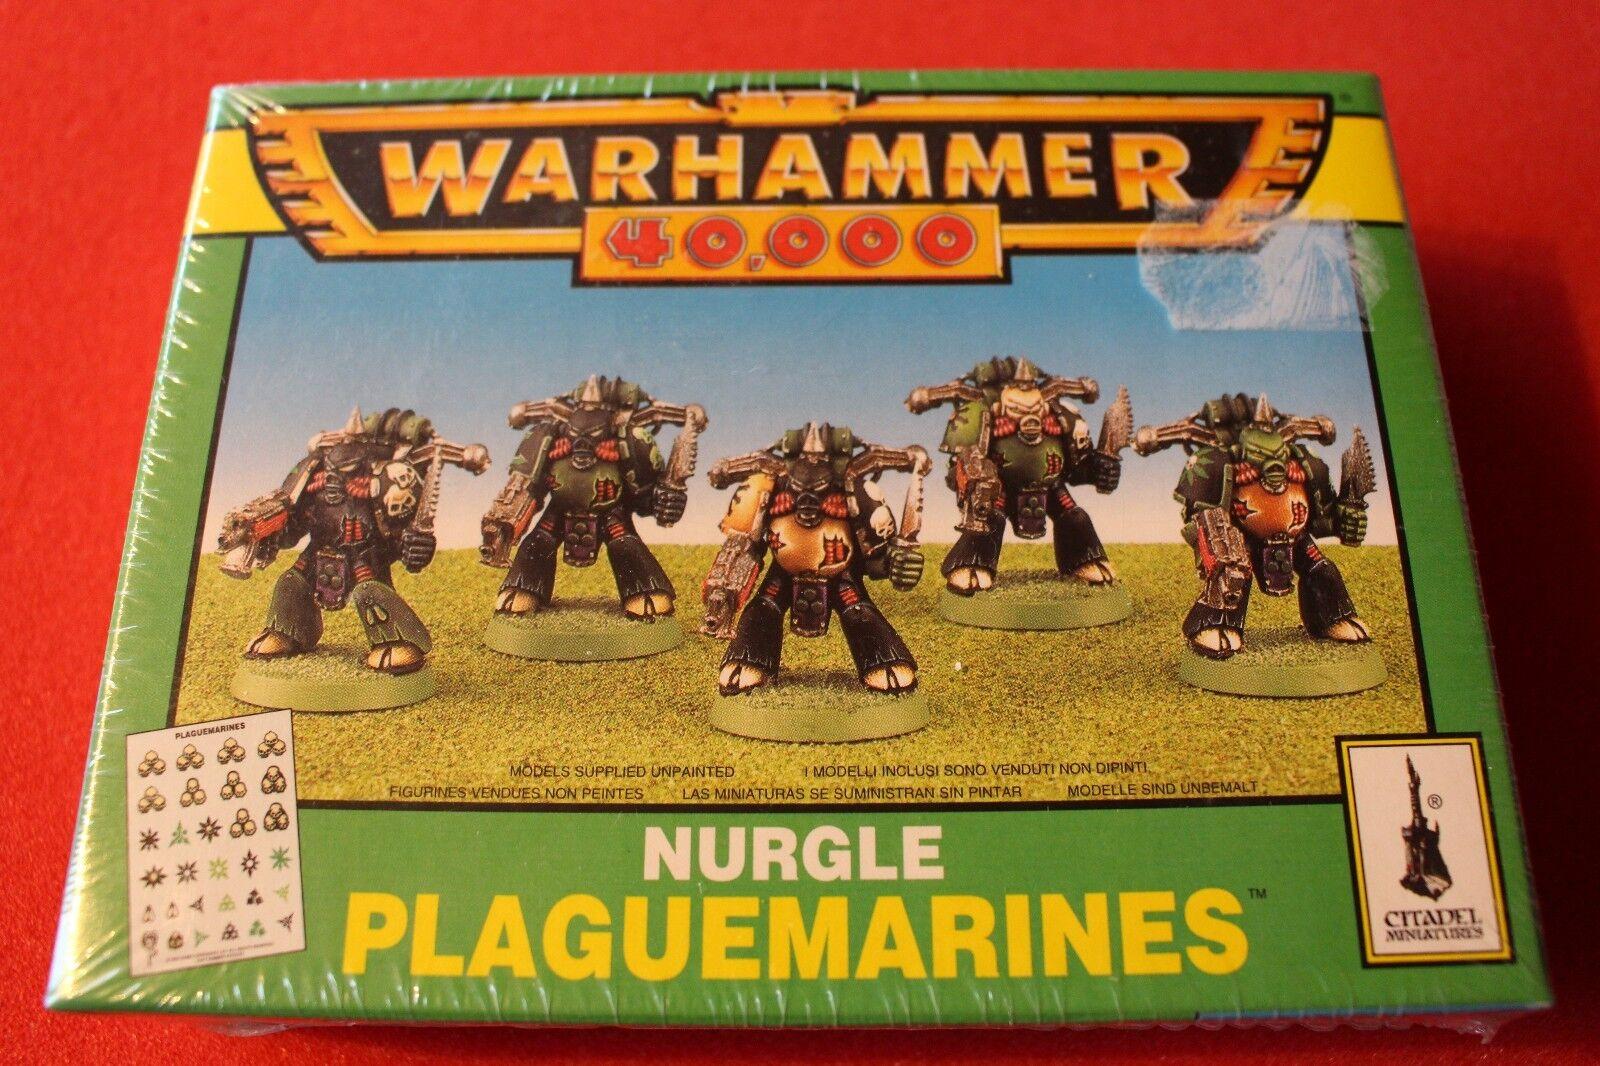 Games Workshop Warhammer 40k Chaos Space Marines Nurgle Plaguemarines BNIB New